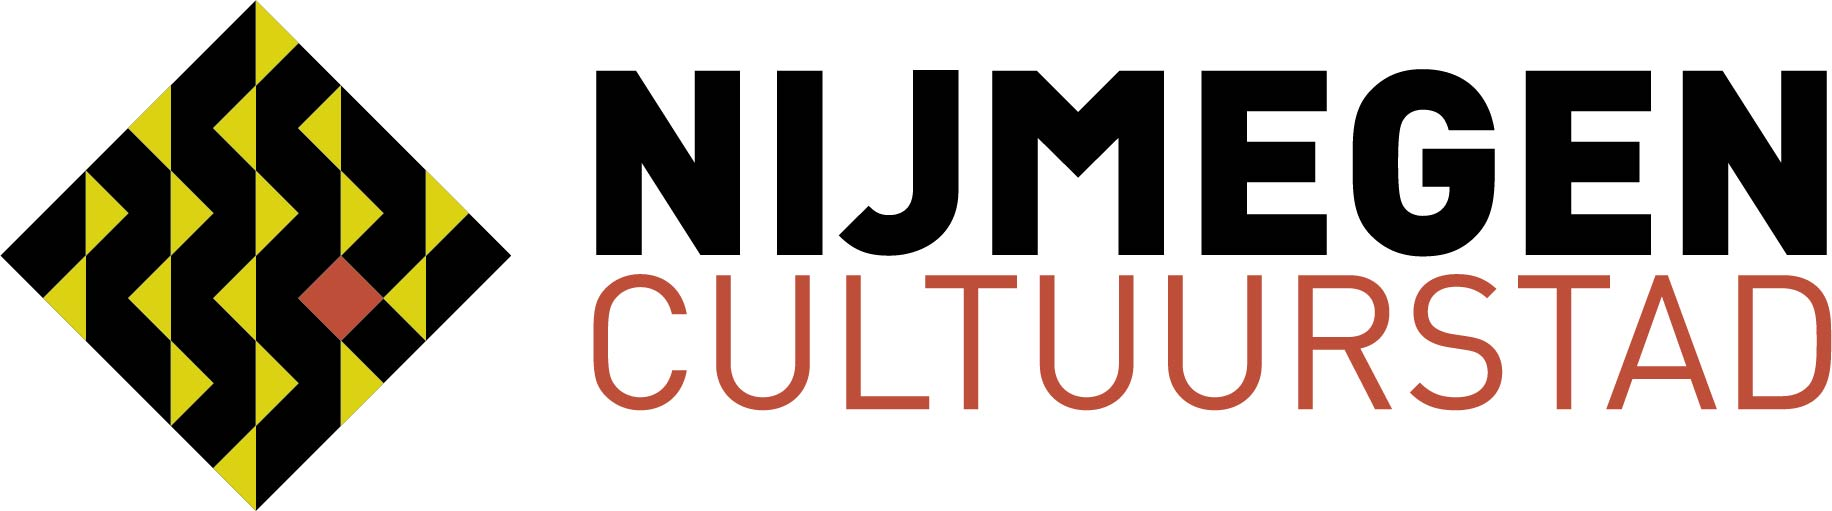 ncs-logo-14-deel2ontw